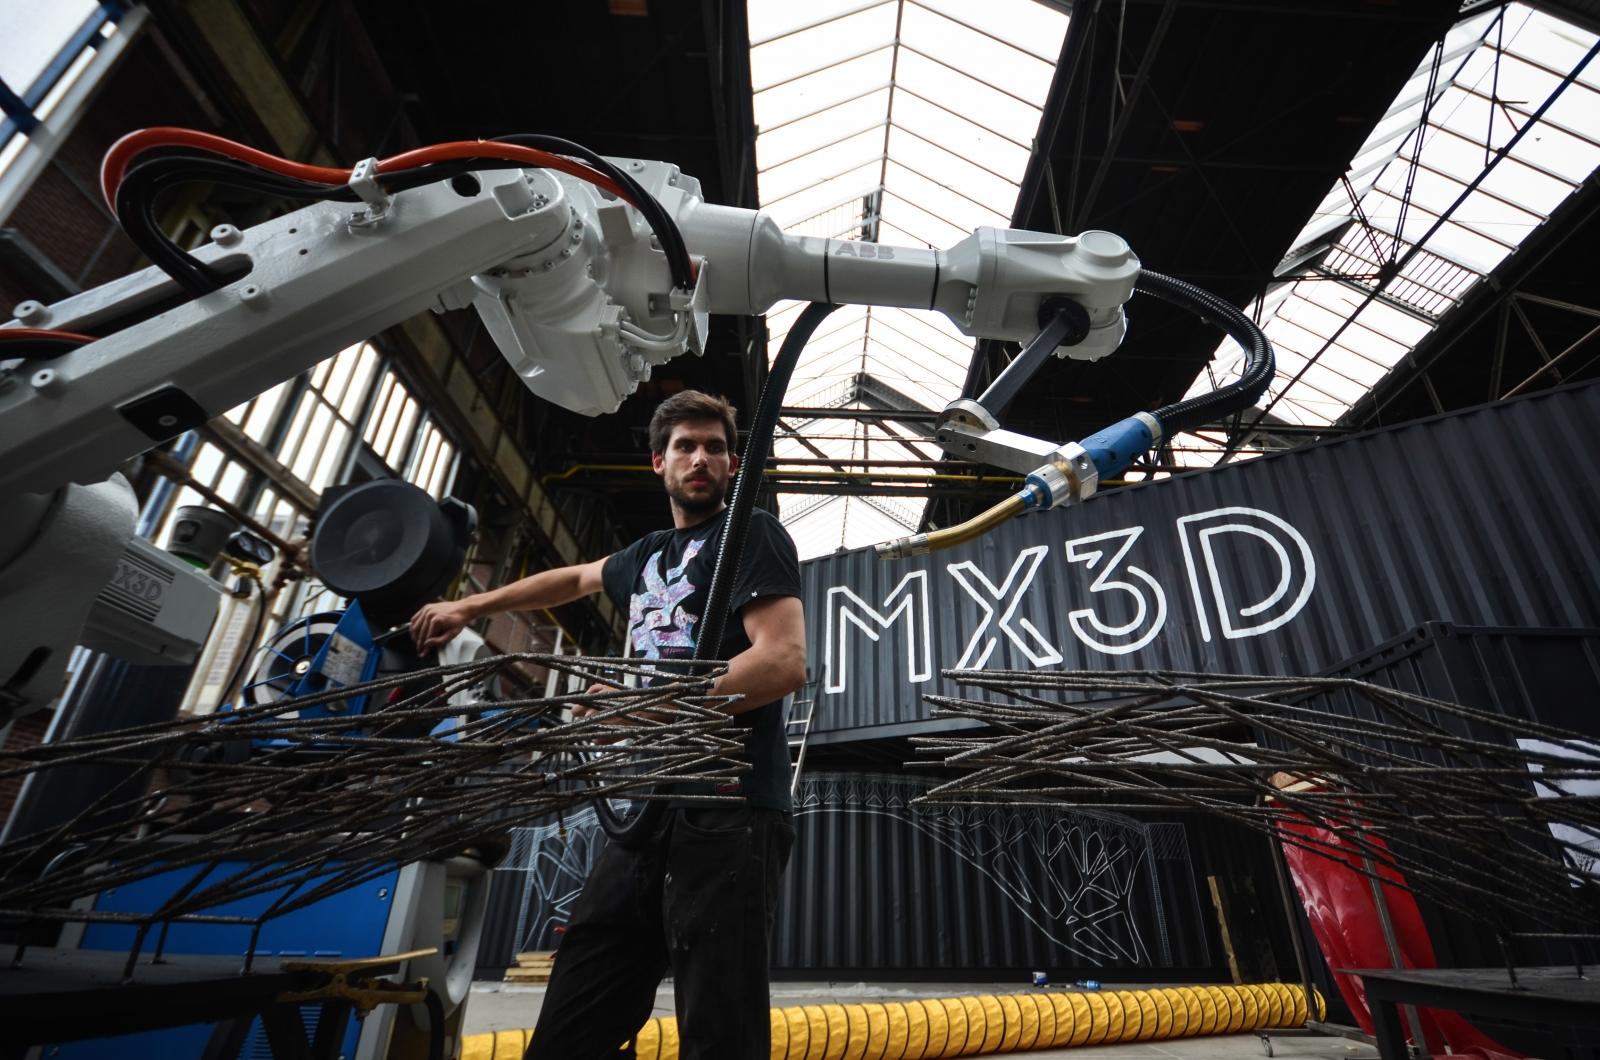 MX3D's robotic arm prints and welds metal